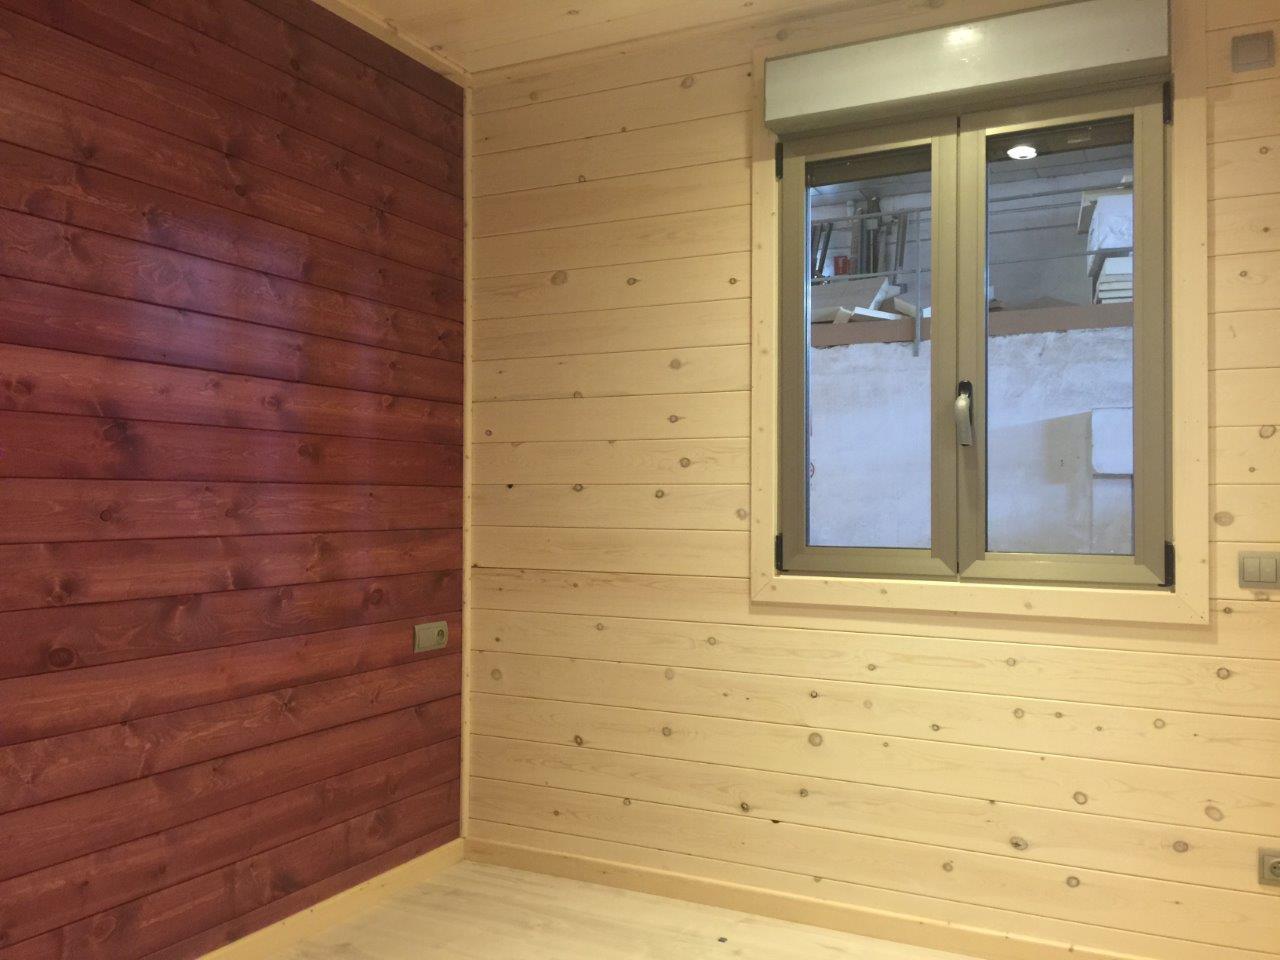 Casa de madera d plex para saint jean de luz for Placas de madera para revestimiento interior